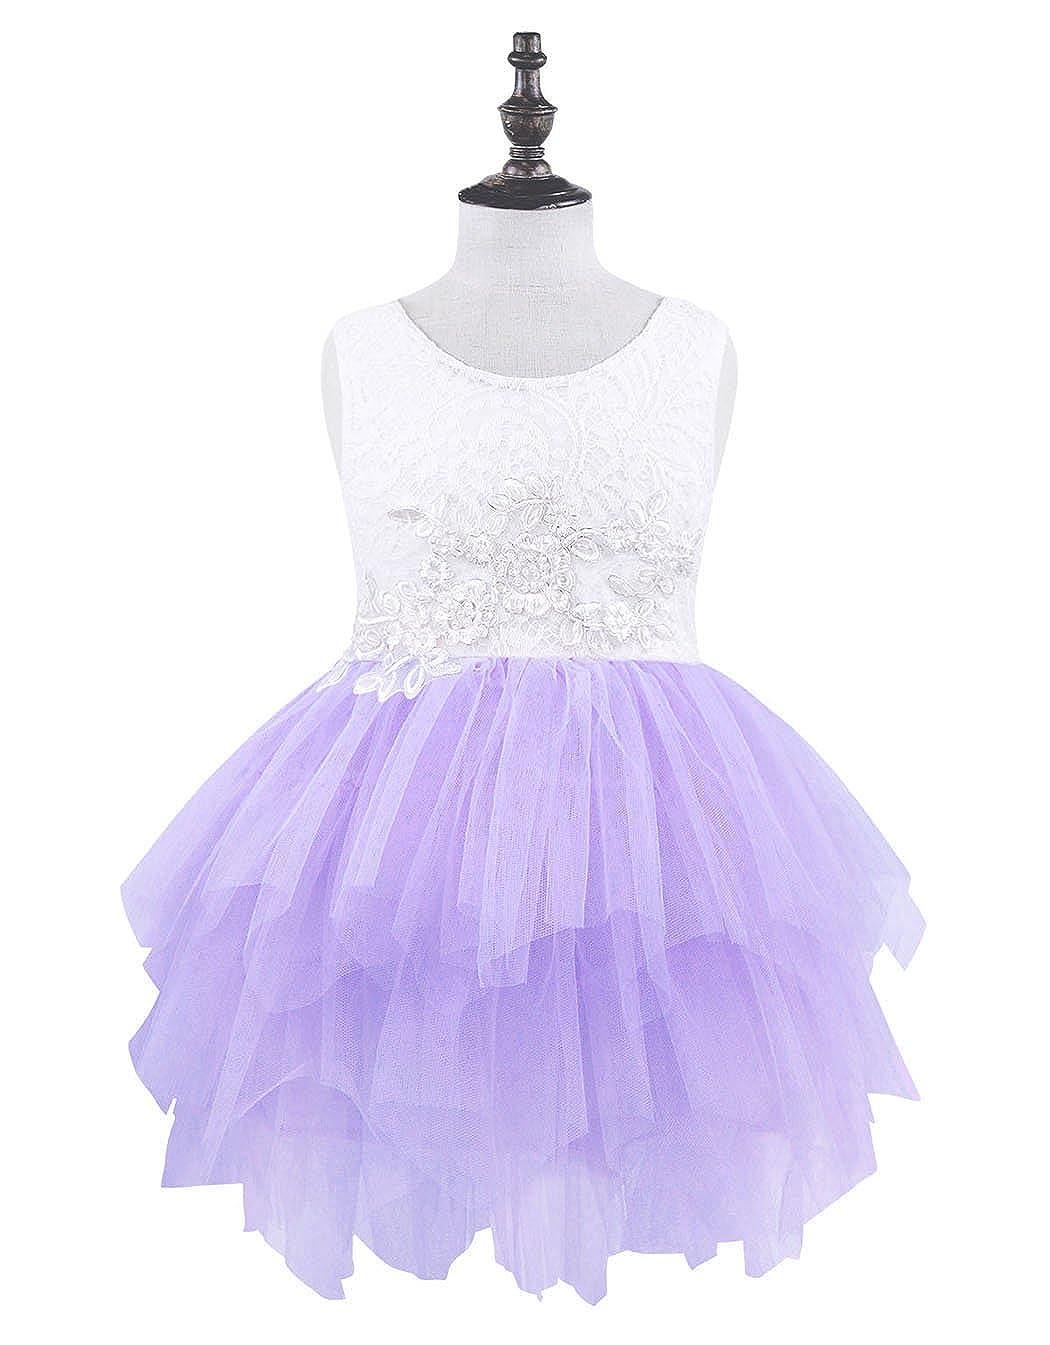 Cotrio Lace Flower Princess Dress Baby Girls Sleeveless Birthday Wedding Pageant Tutu Dress